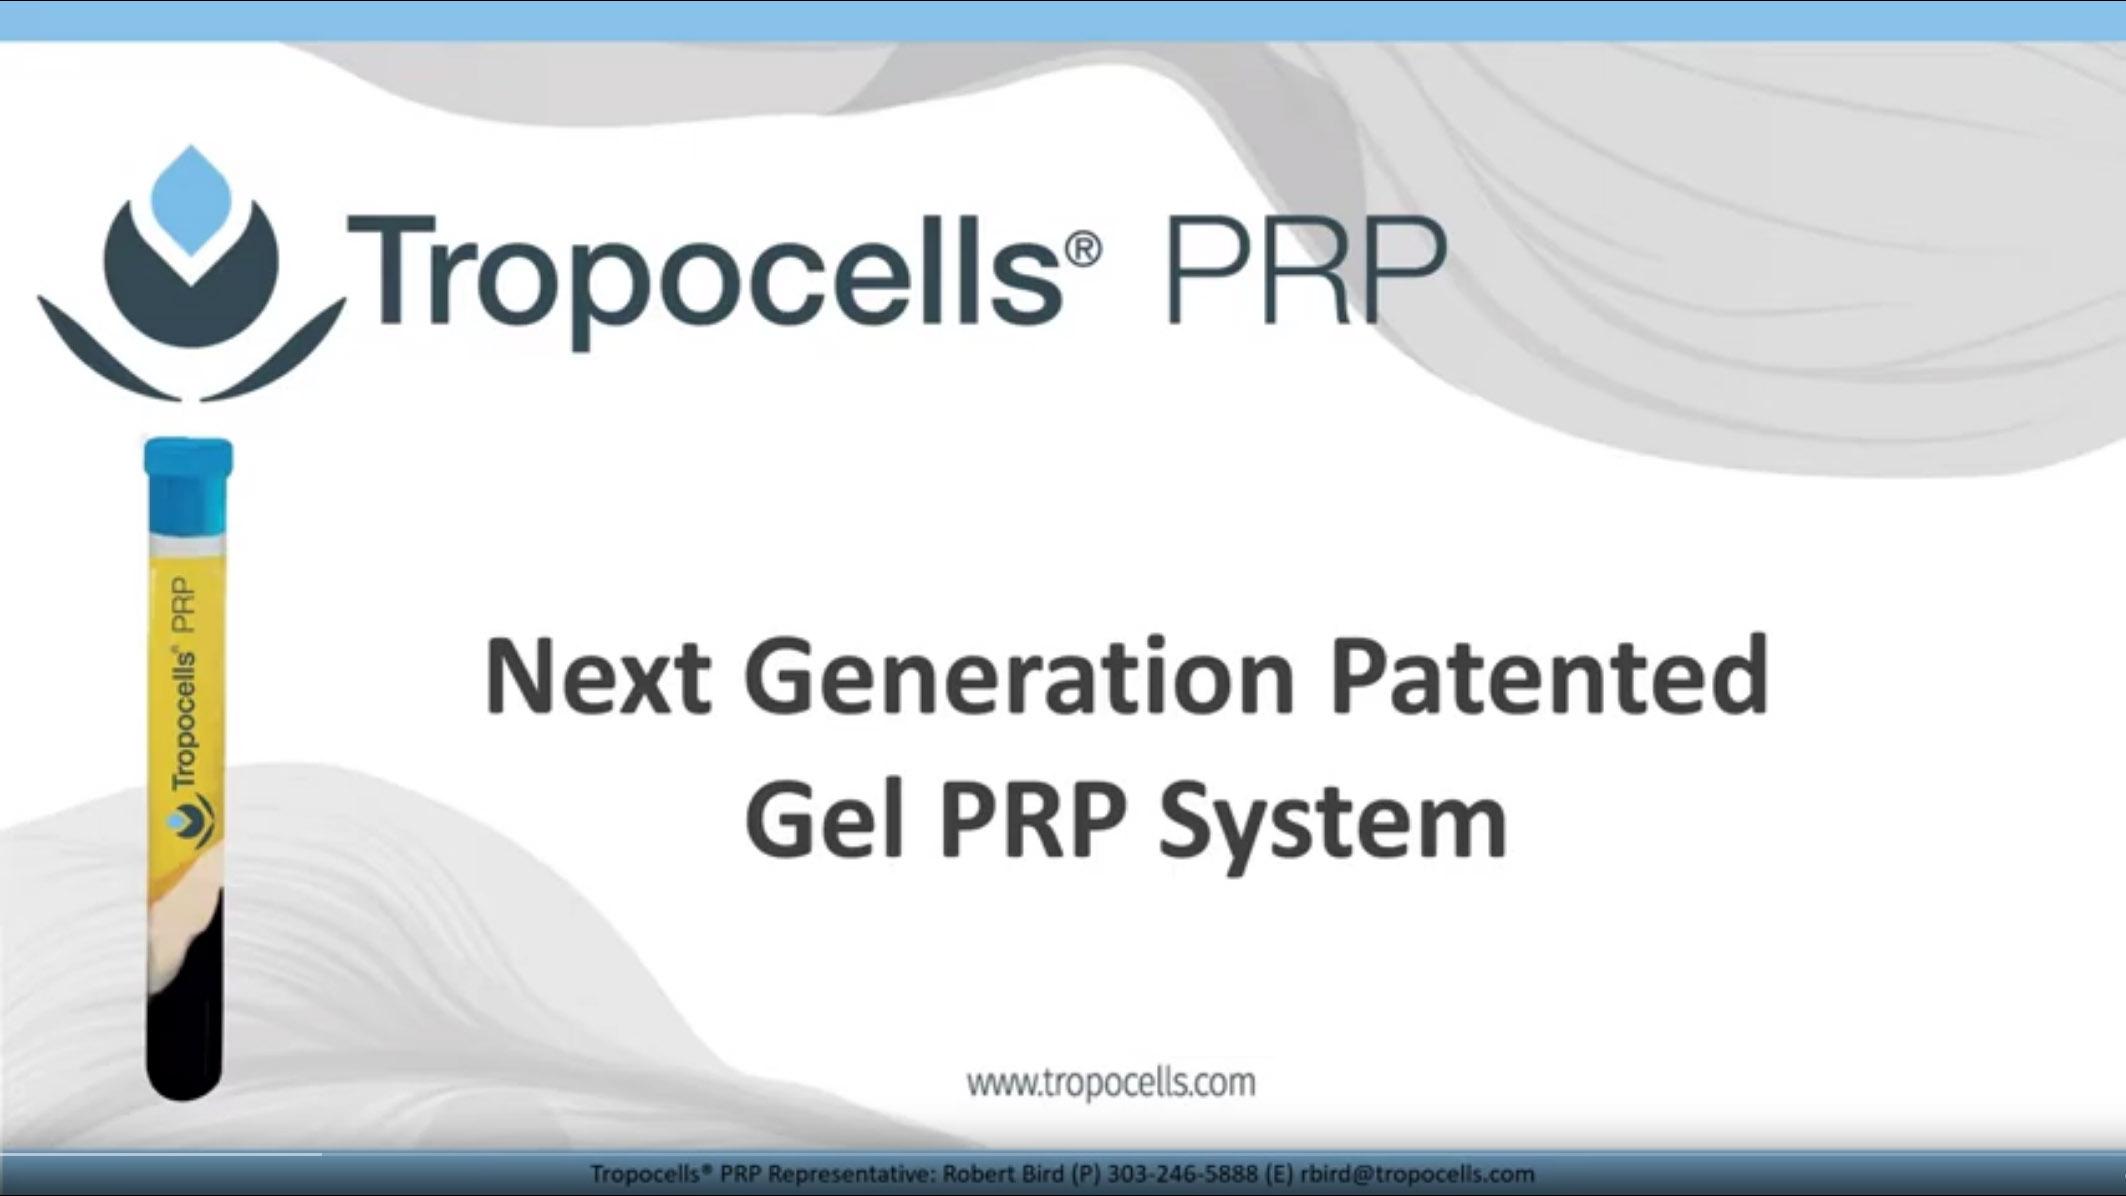 TropocellsPRP-Patented-Gel-Technology